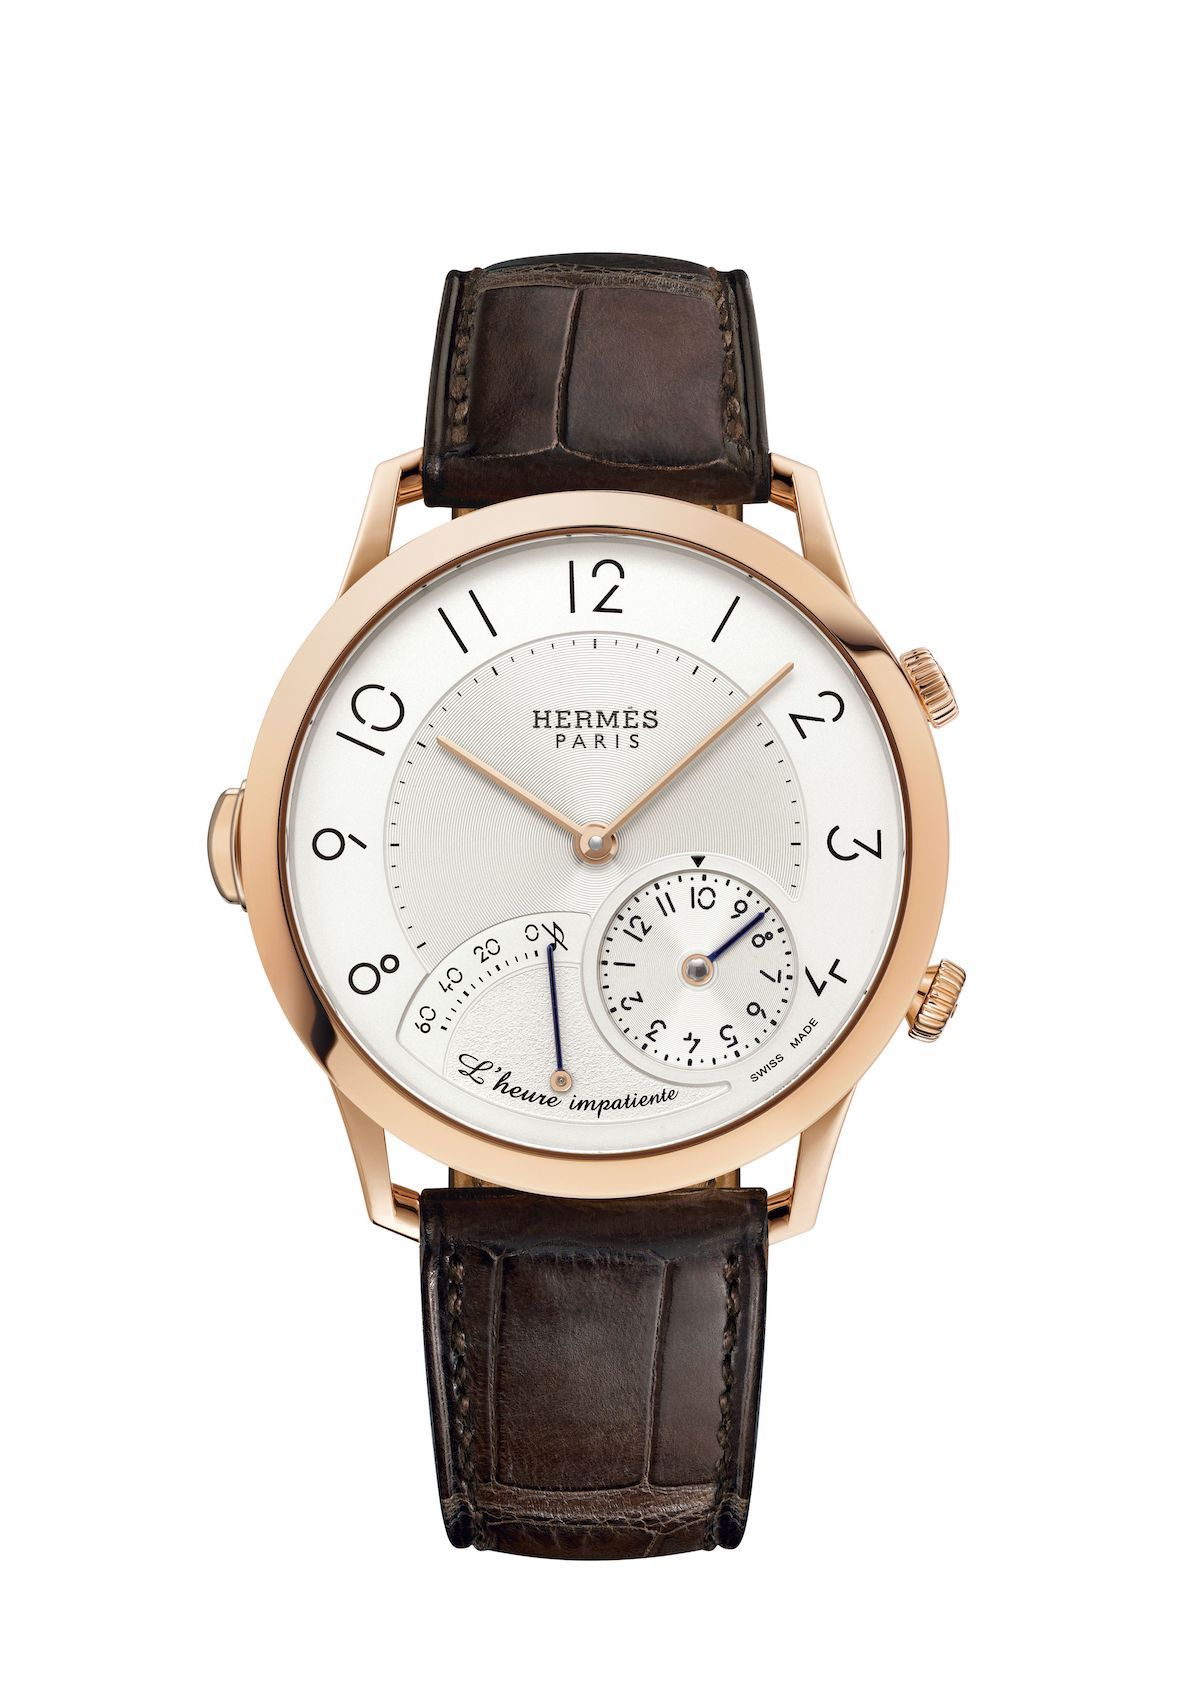 half off 50c43 cb87c 6月の「エルメス」祇園店は時計がテーマ 2017年新作を先行販売 ...